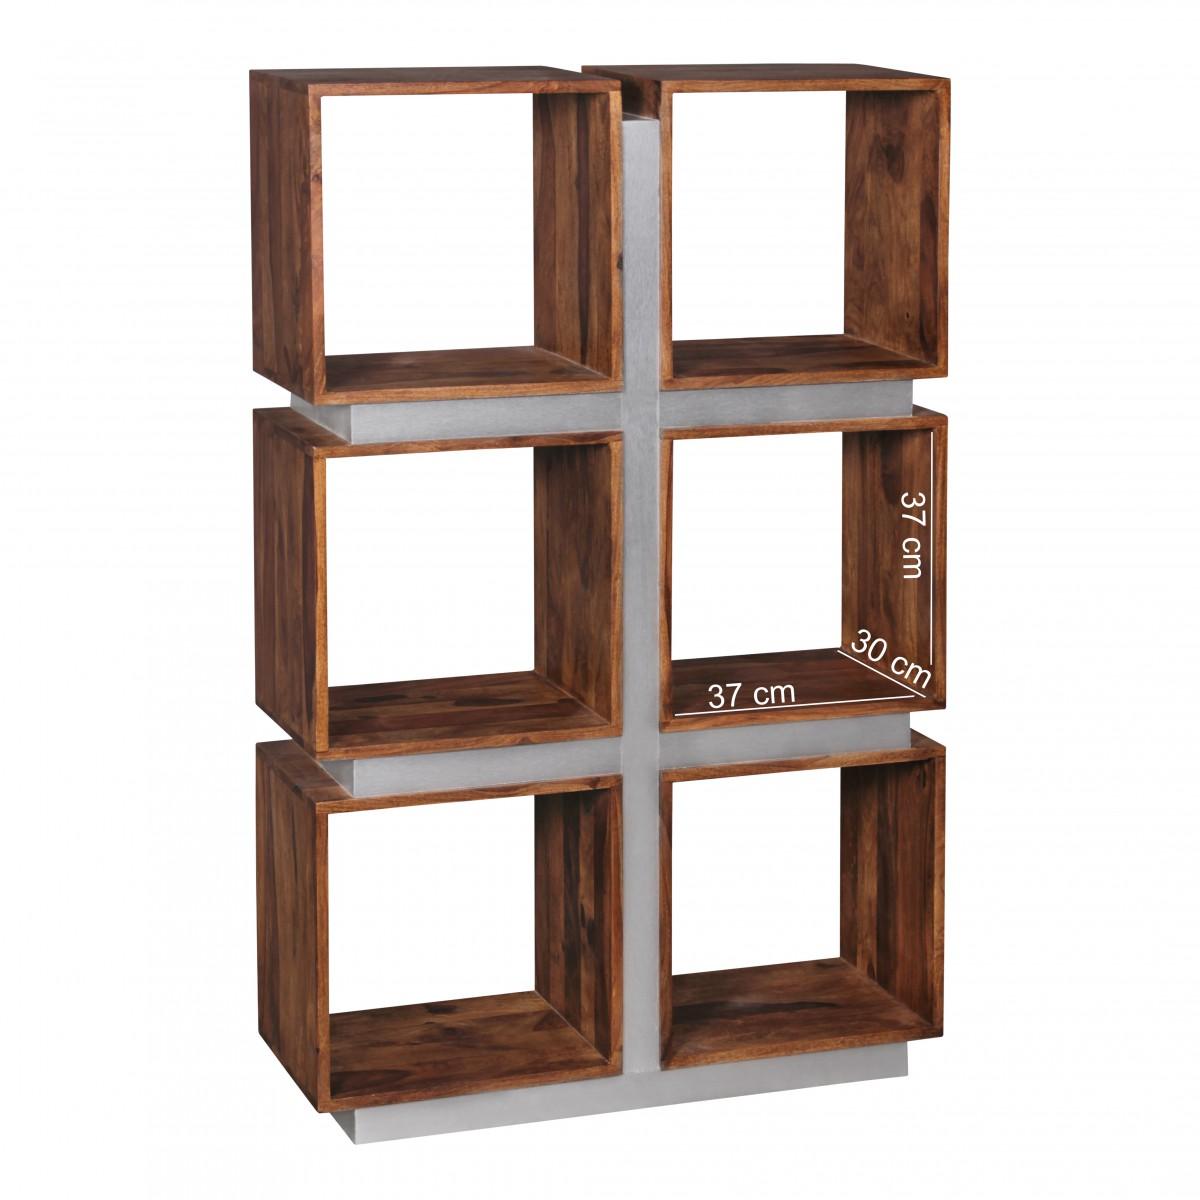 wohnling b cherregal massivholz sheesham 135x85cm raumteiler regal landhaus stil ebay. Black Bedroom Furniture Sets. Home Design Ideas